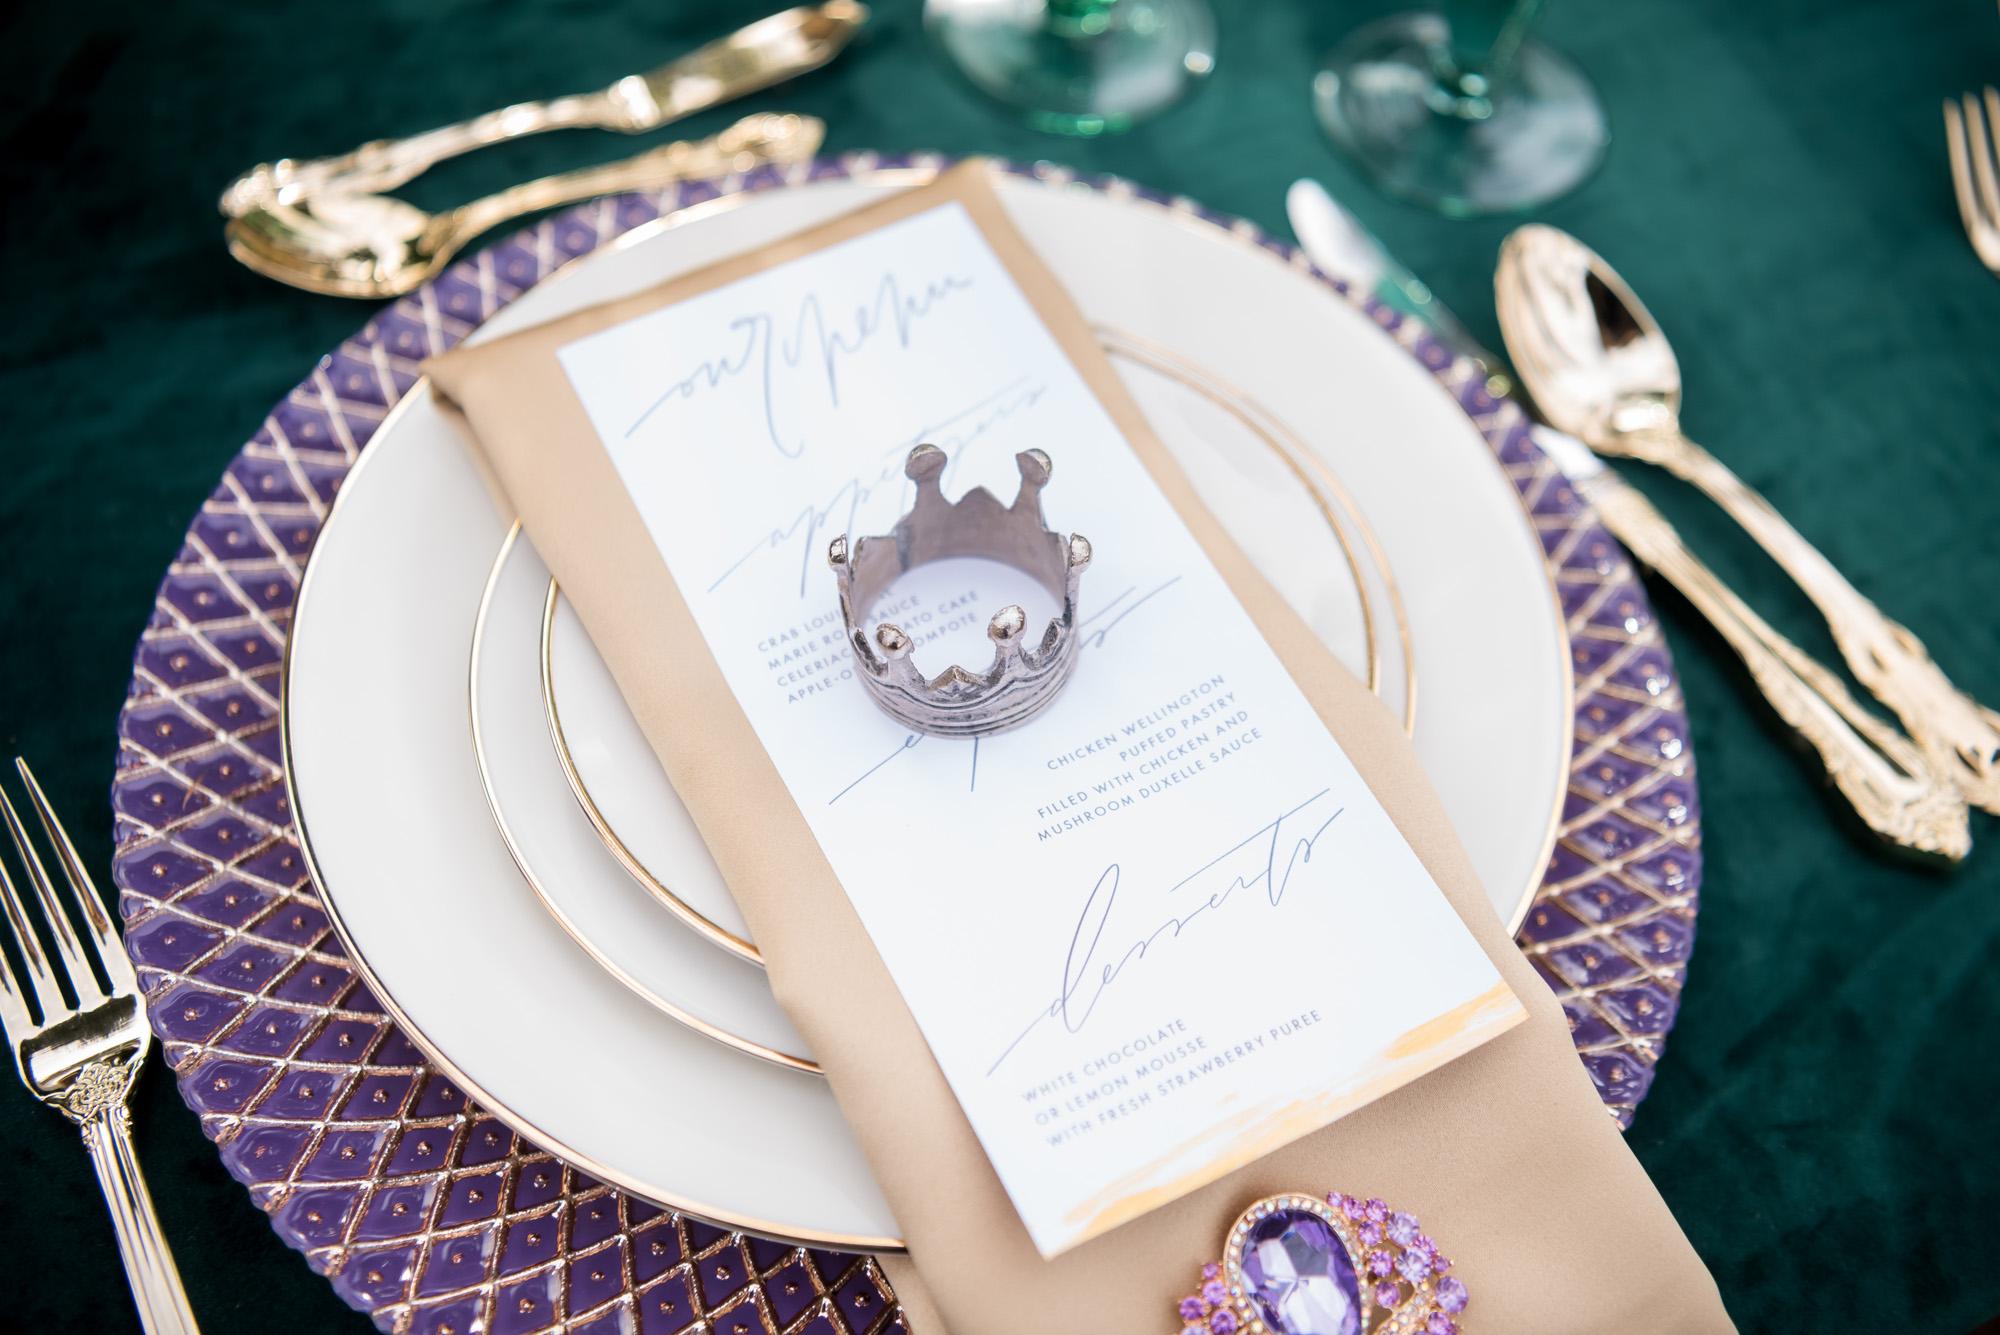 KMH-RoyalWeddingInspiration-lowres-0005.jpg